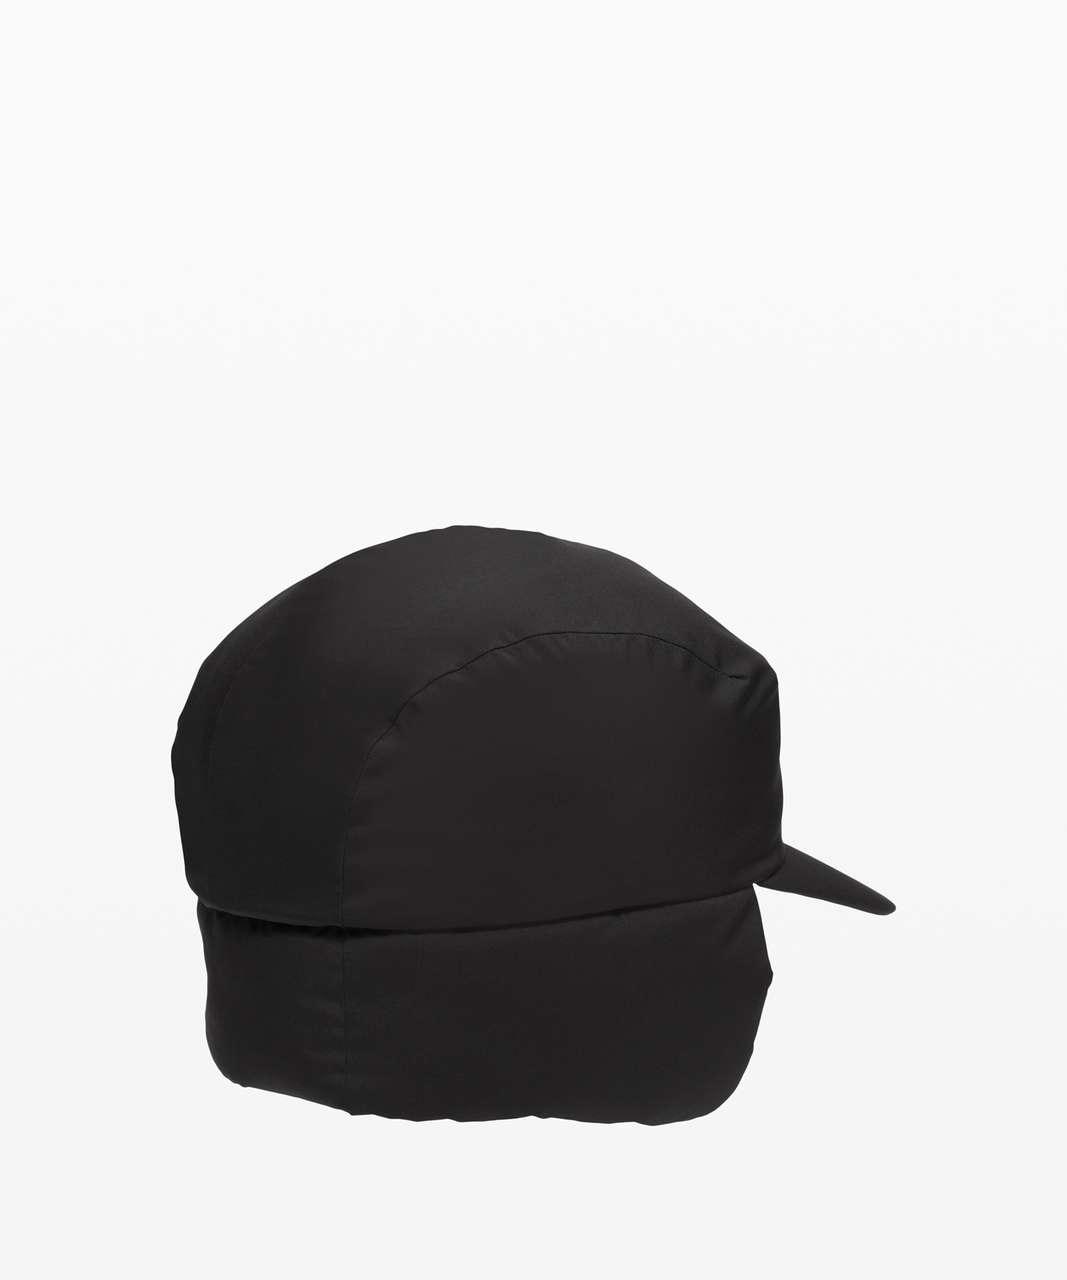 Lululemon Pure Puff Trapper Hat - Black